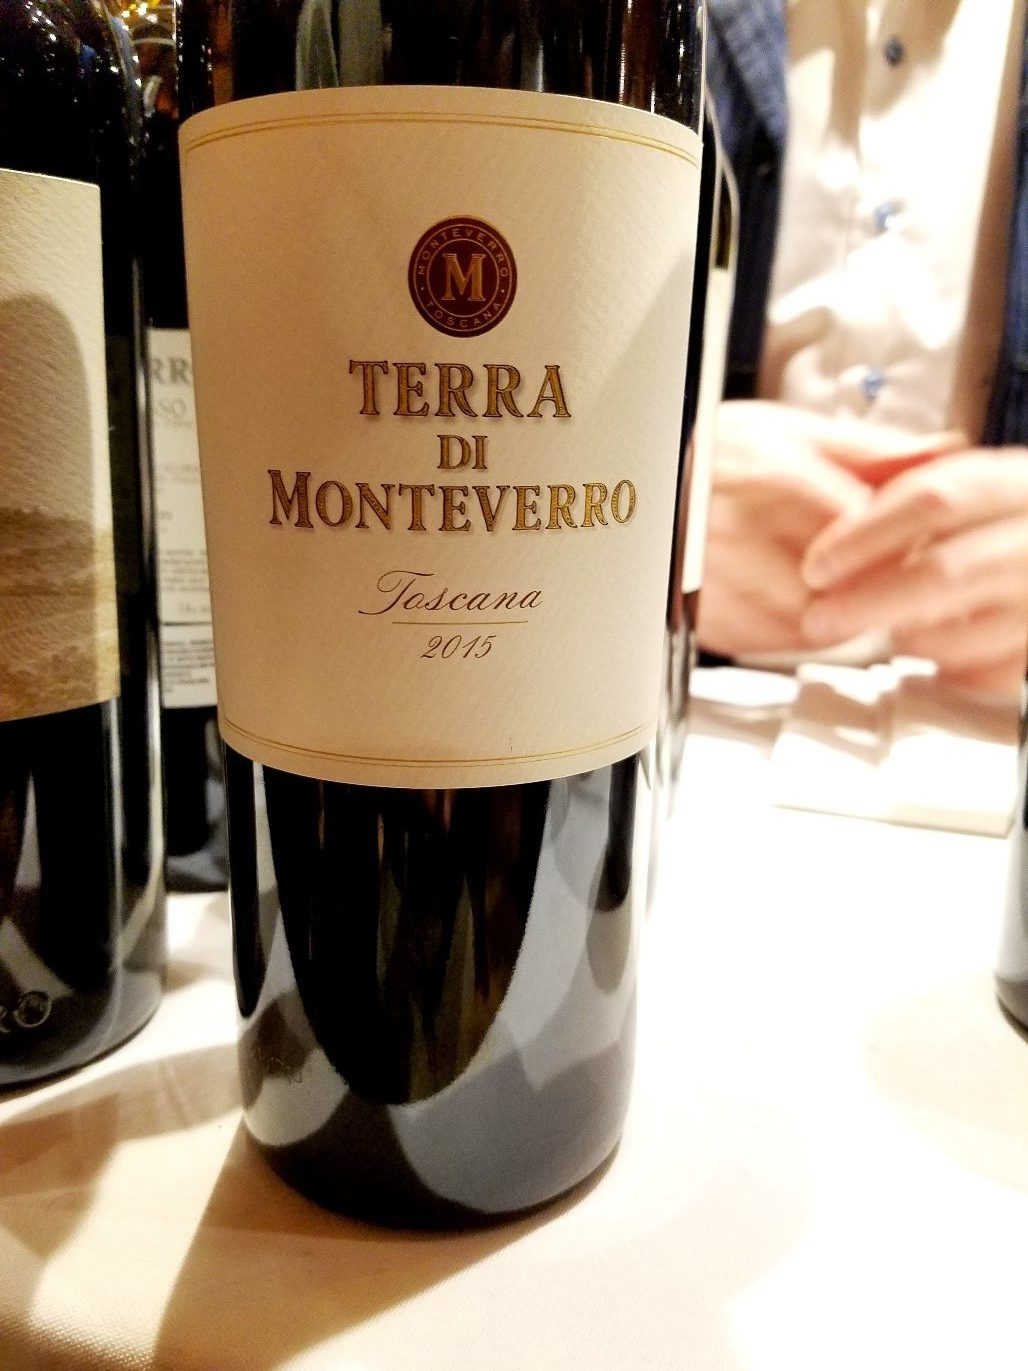 Monteverro Terra di Monteverro Toscana 2015, James Suckling Great Wines of Italy New York 2020, Wine Casual